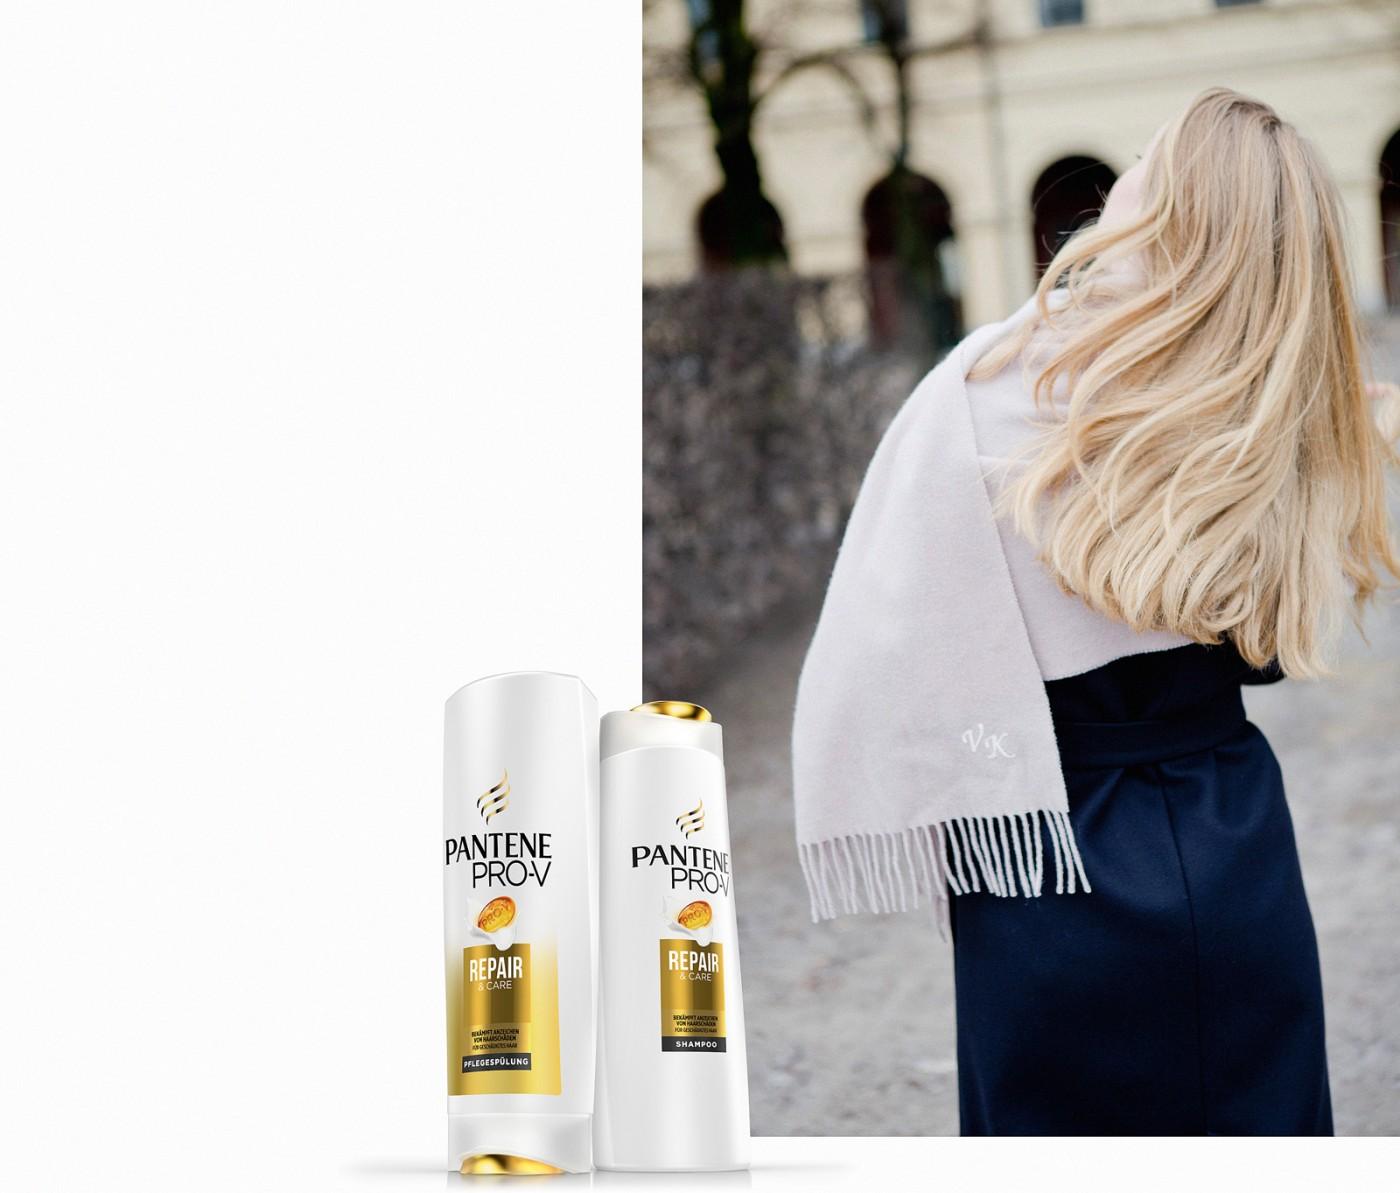 Pantene Pflegespülung SMART Pro-V Formel, Pantene SMART Pro-V Palina Rojinski, Haare, richtige Pflege für Haare